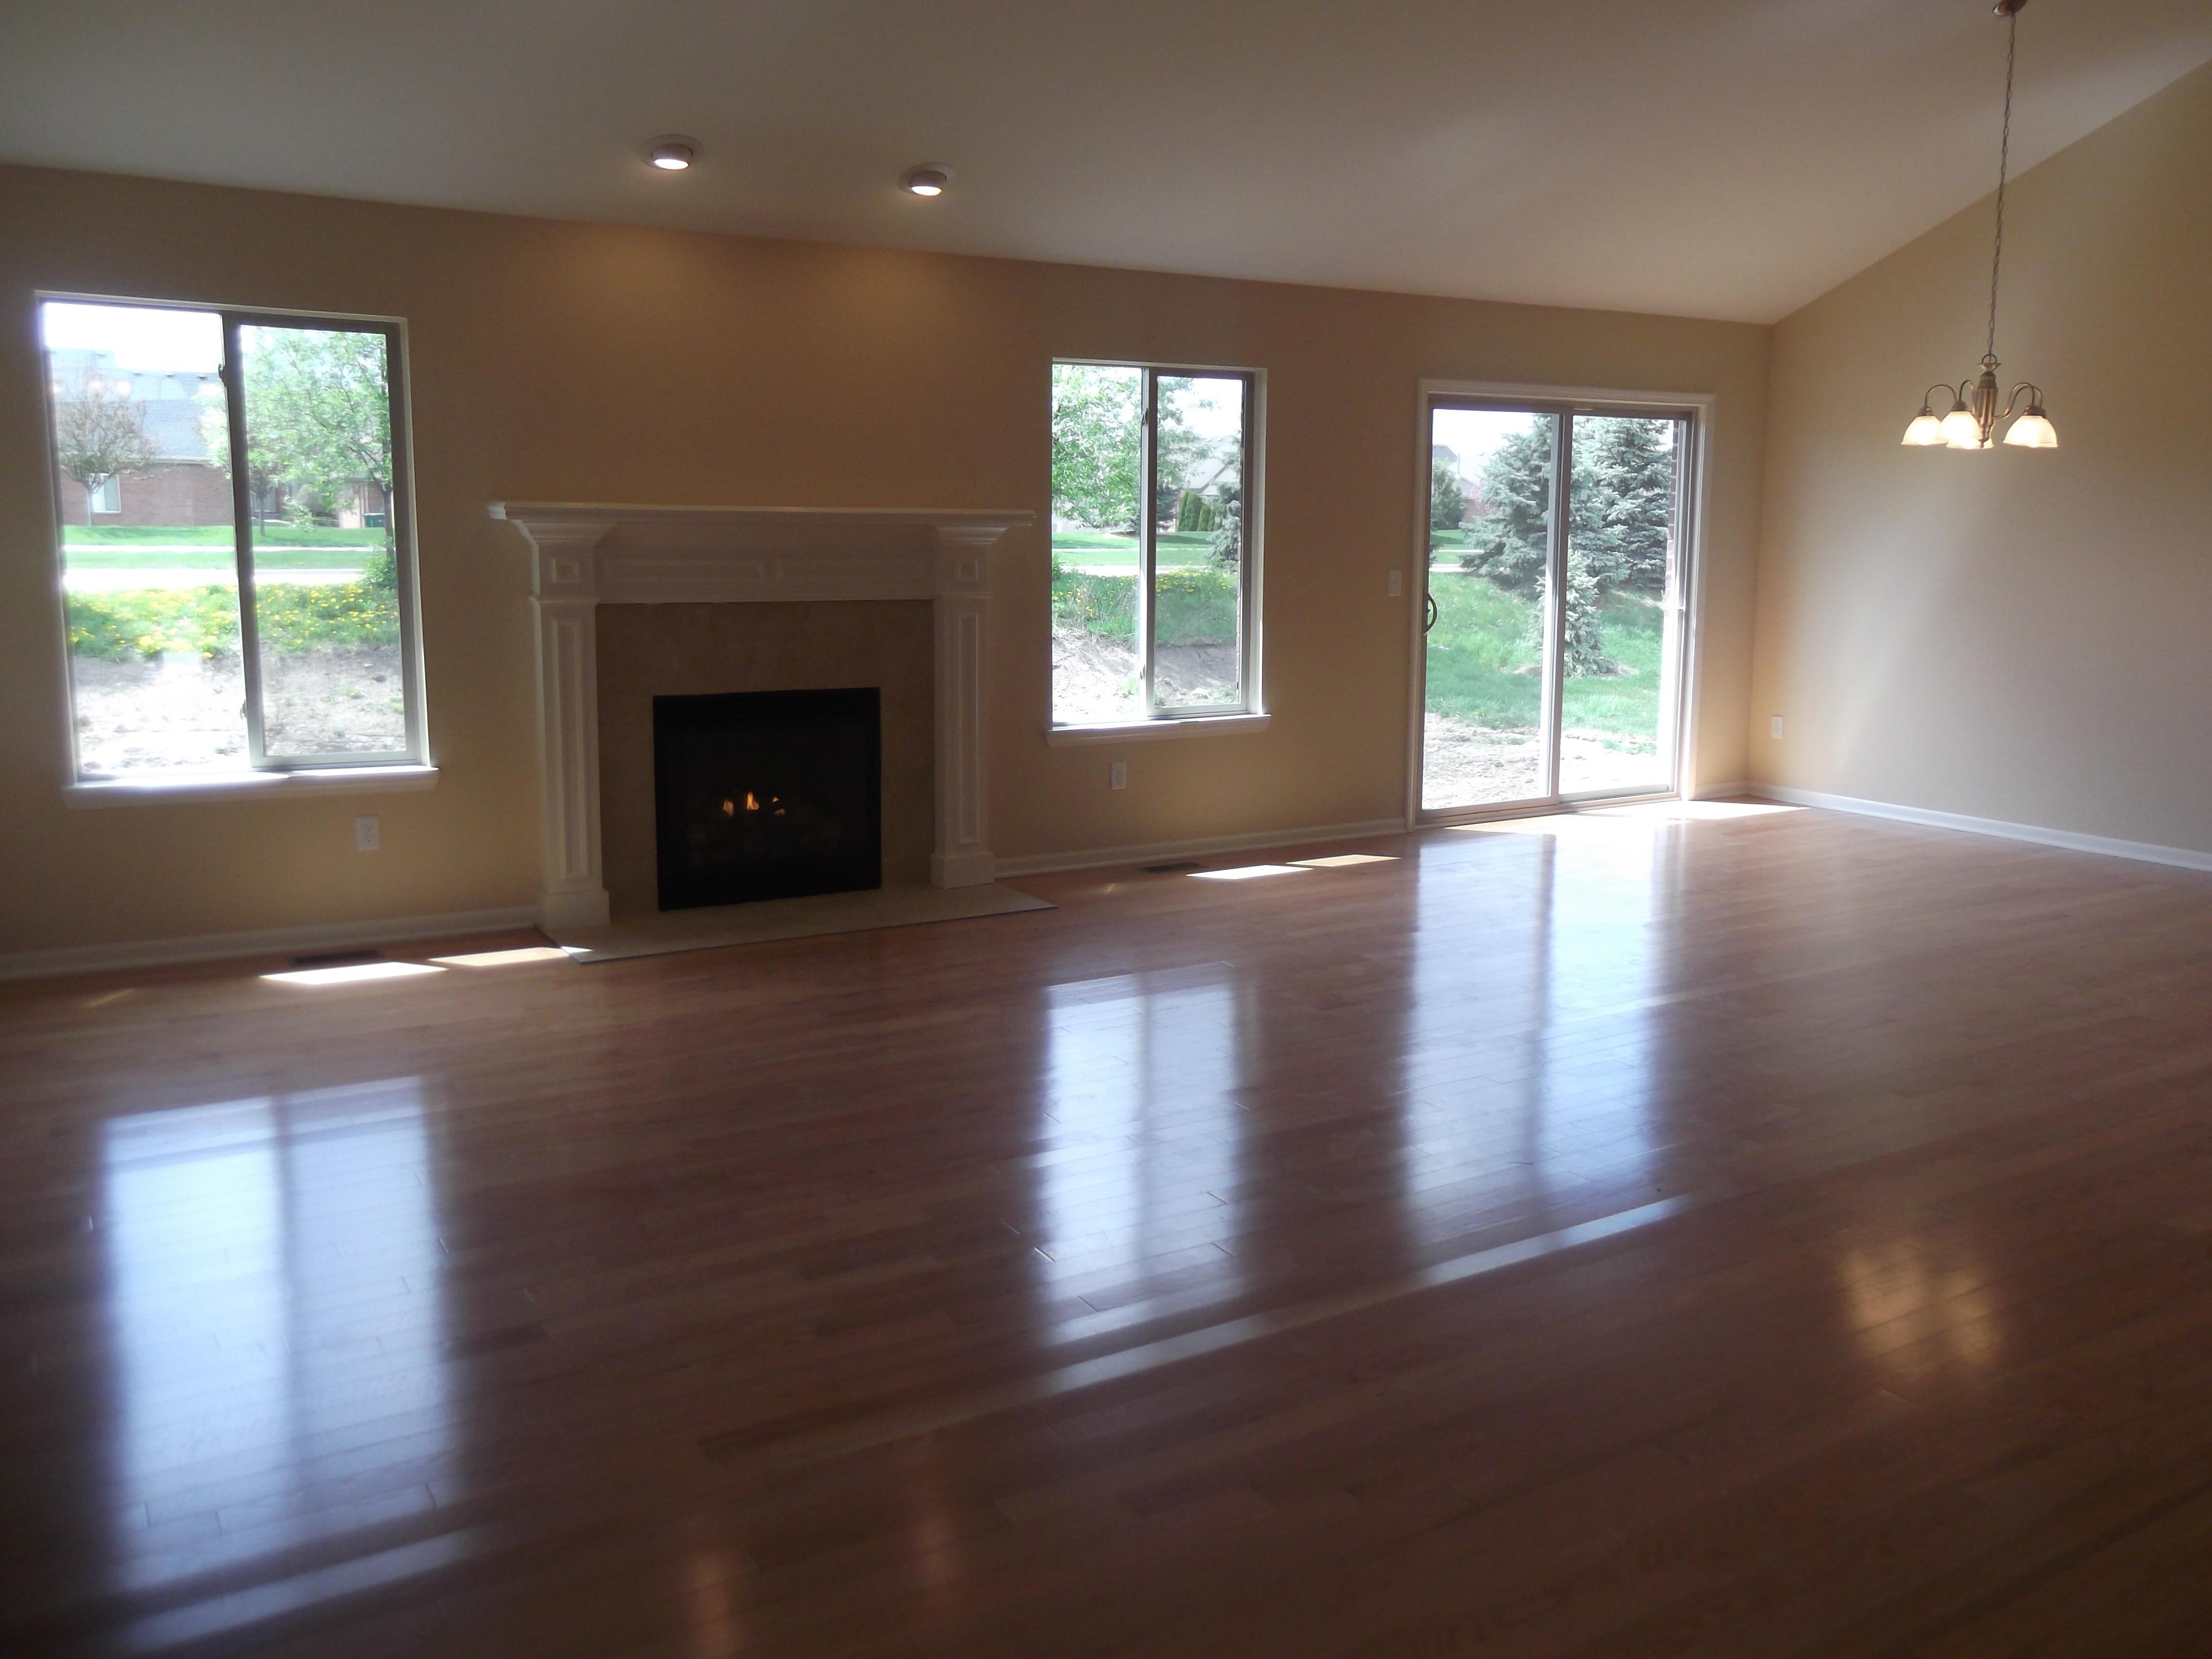 New Homes For Sale, Chestnut R. Gr